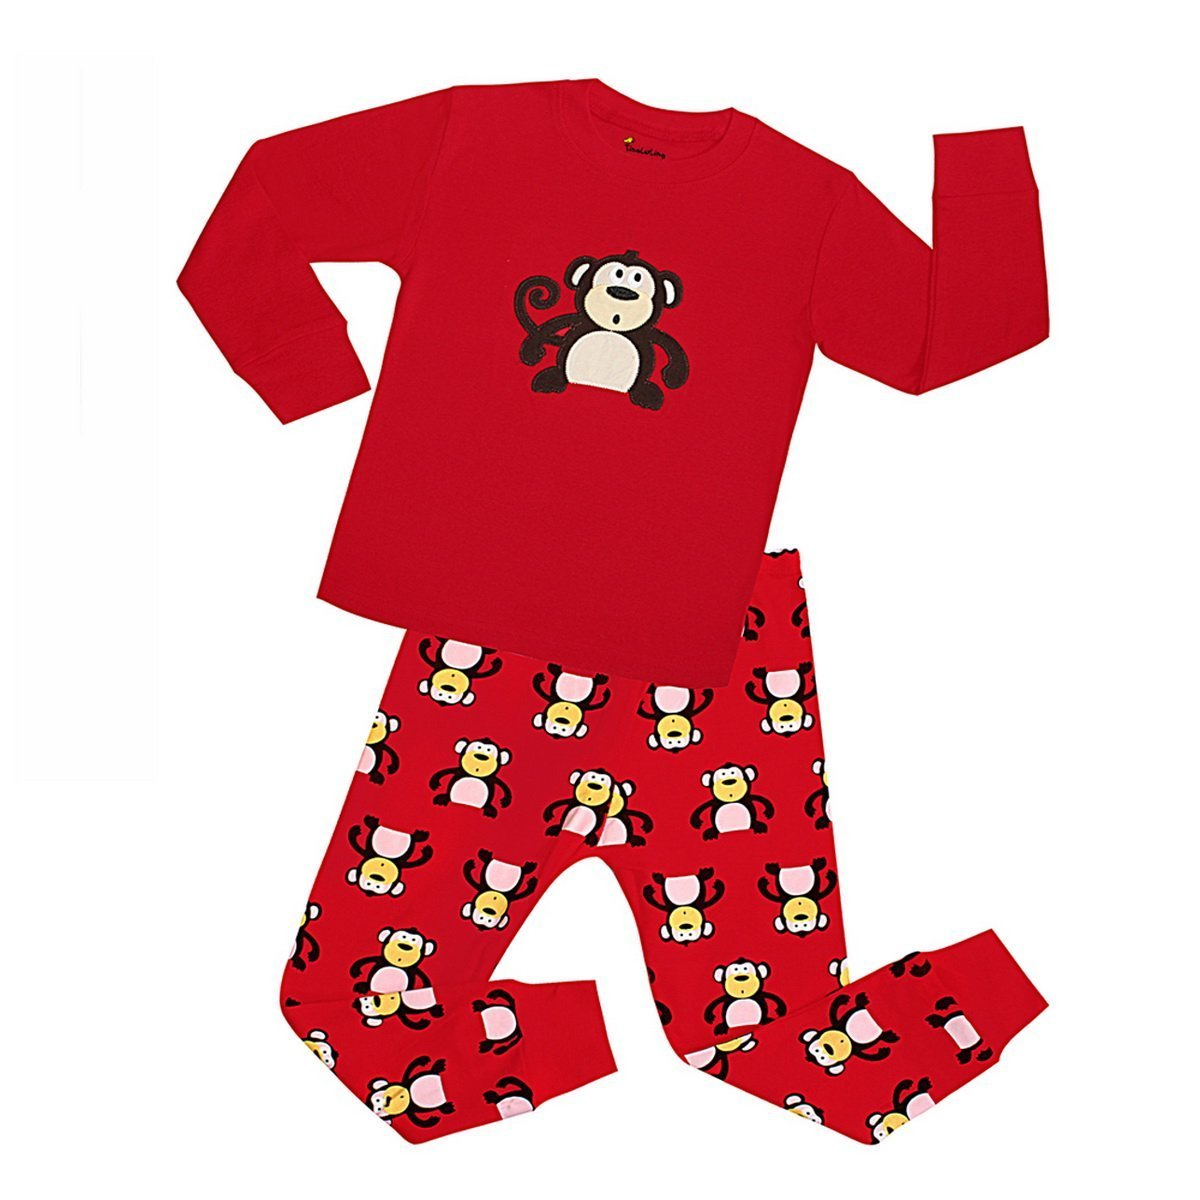 Fribro Little Boys Cartoon Pajamas Kids Long Sleeve Sleepwear Toddler PJS